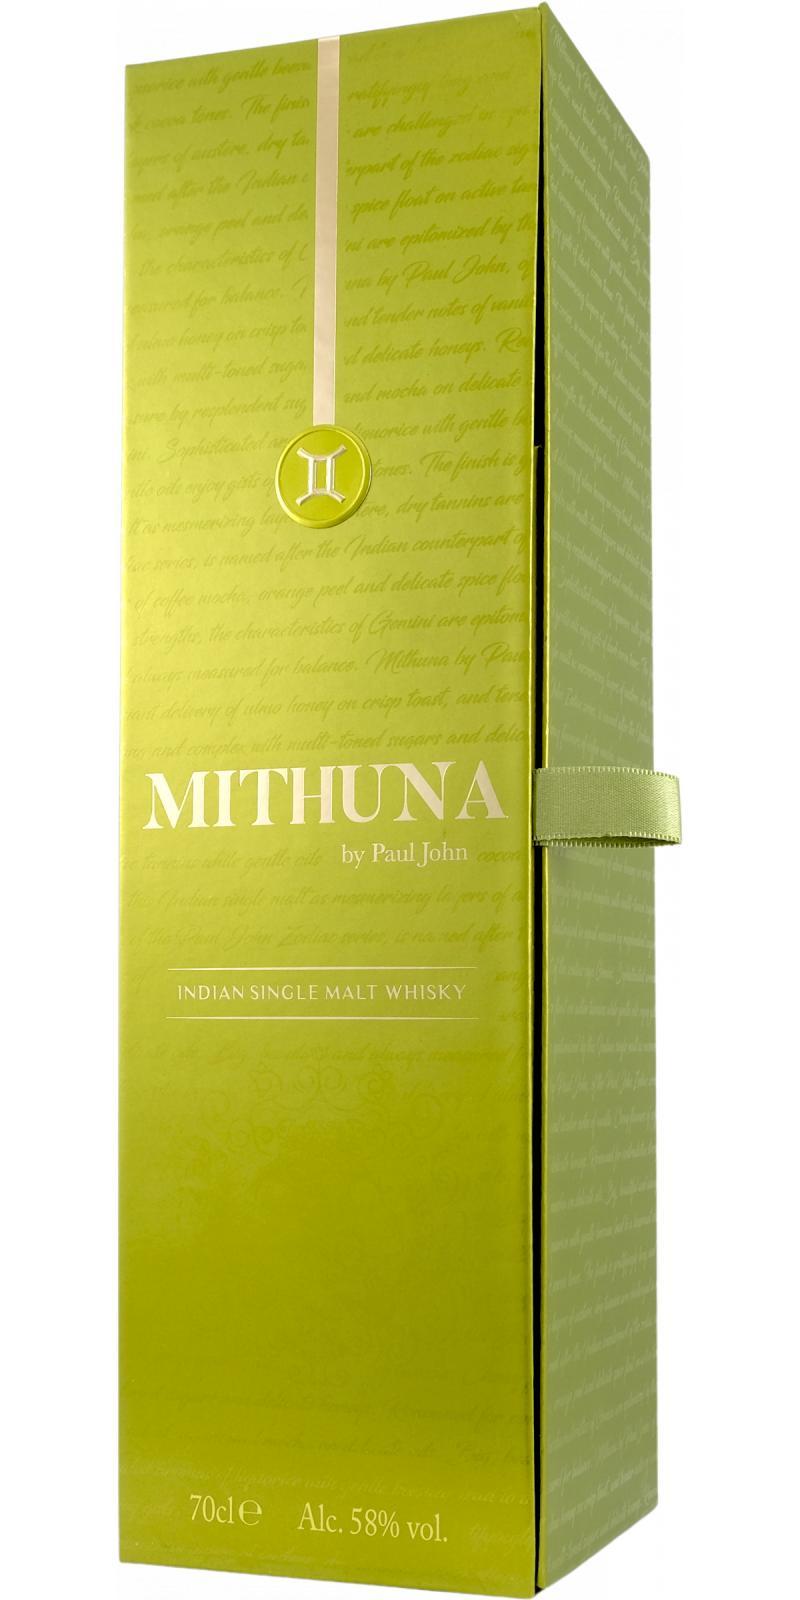 Paul John Mithuna